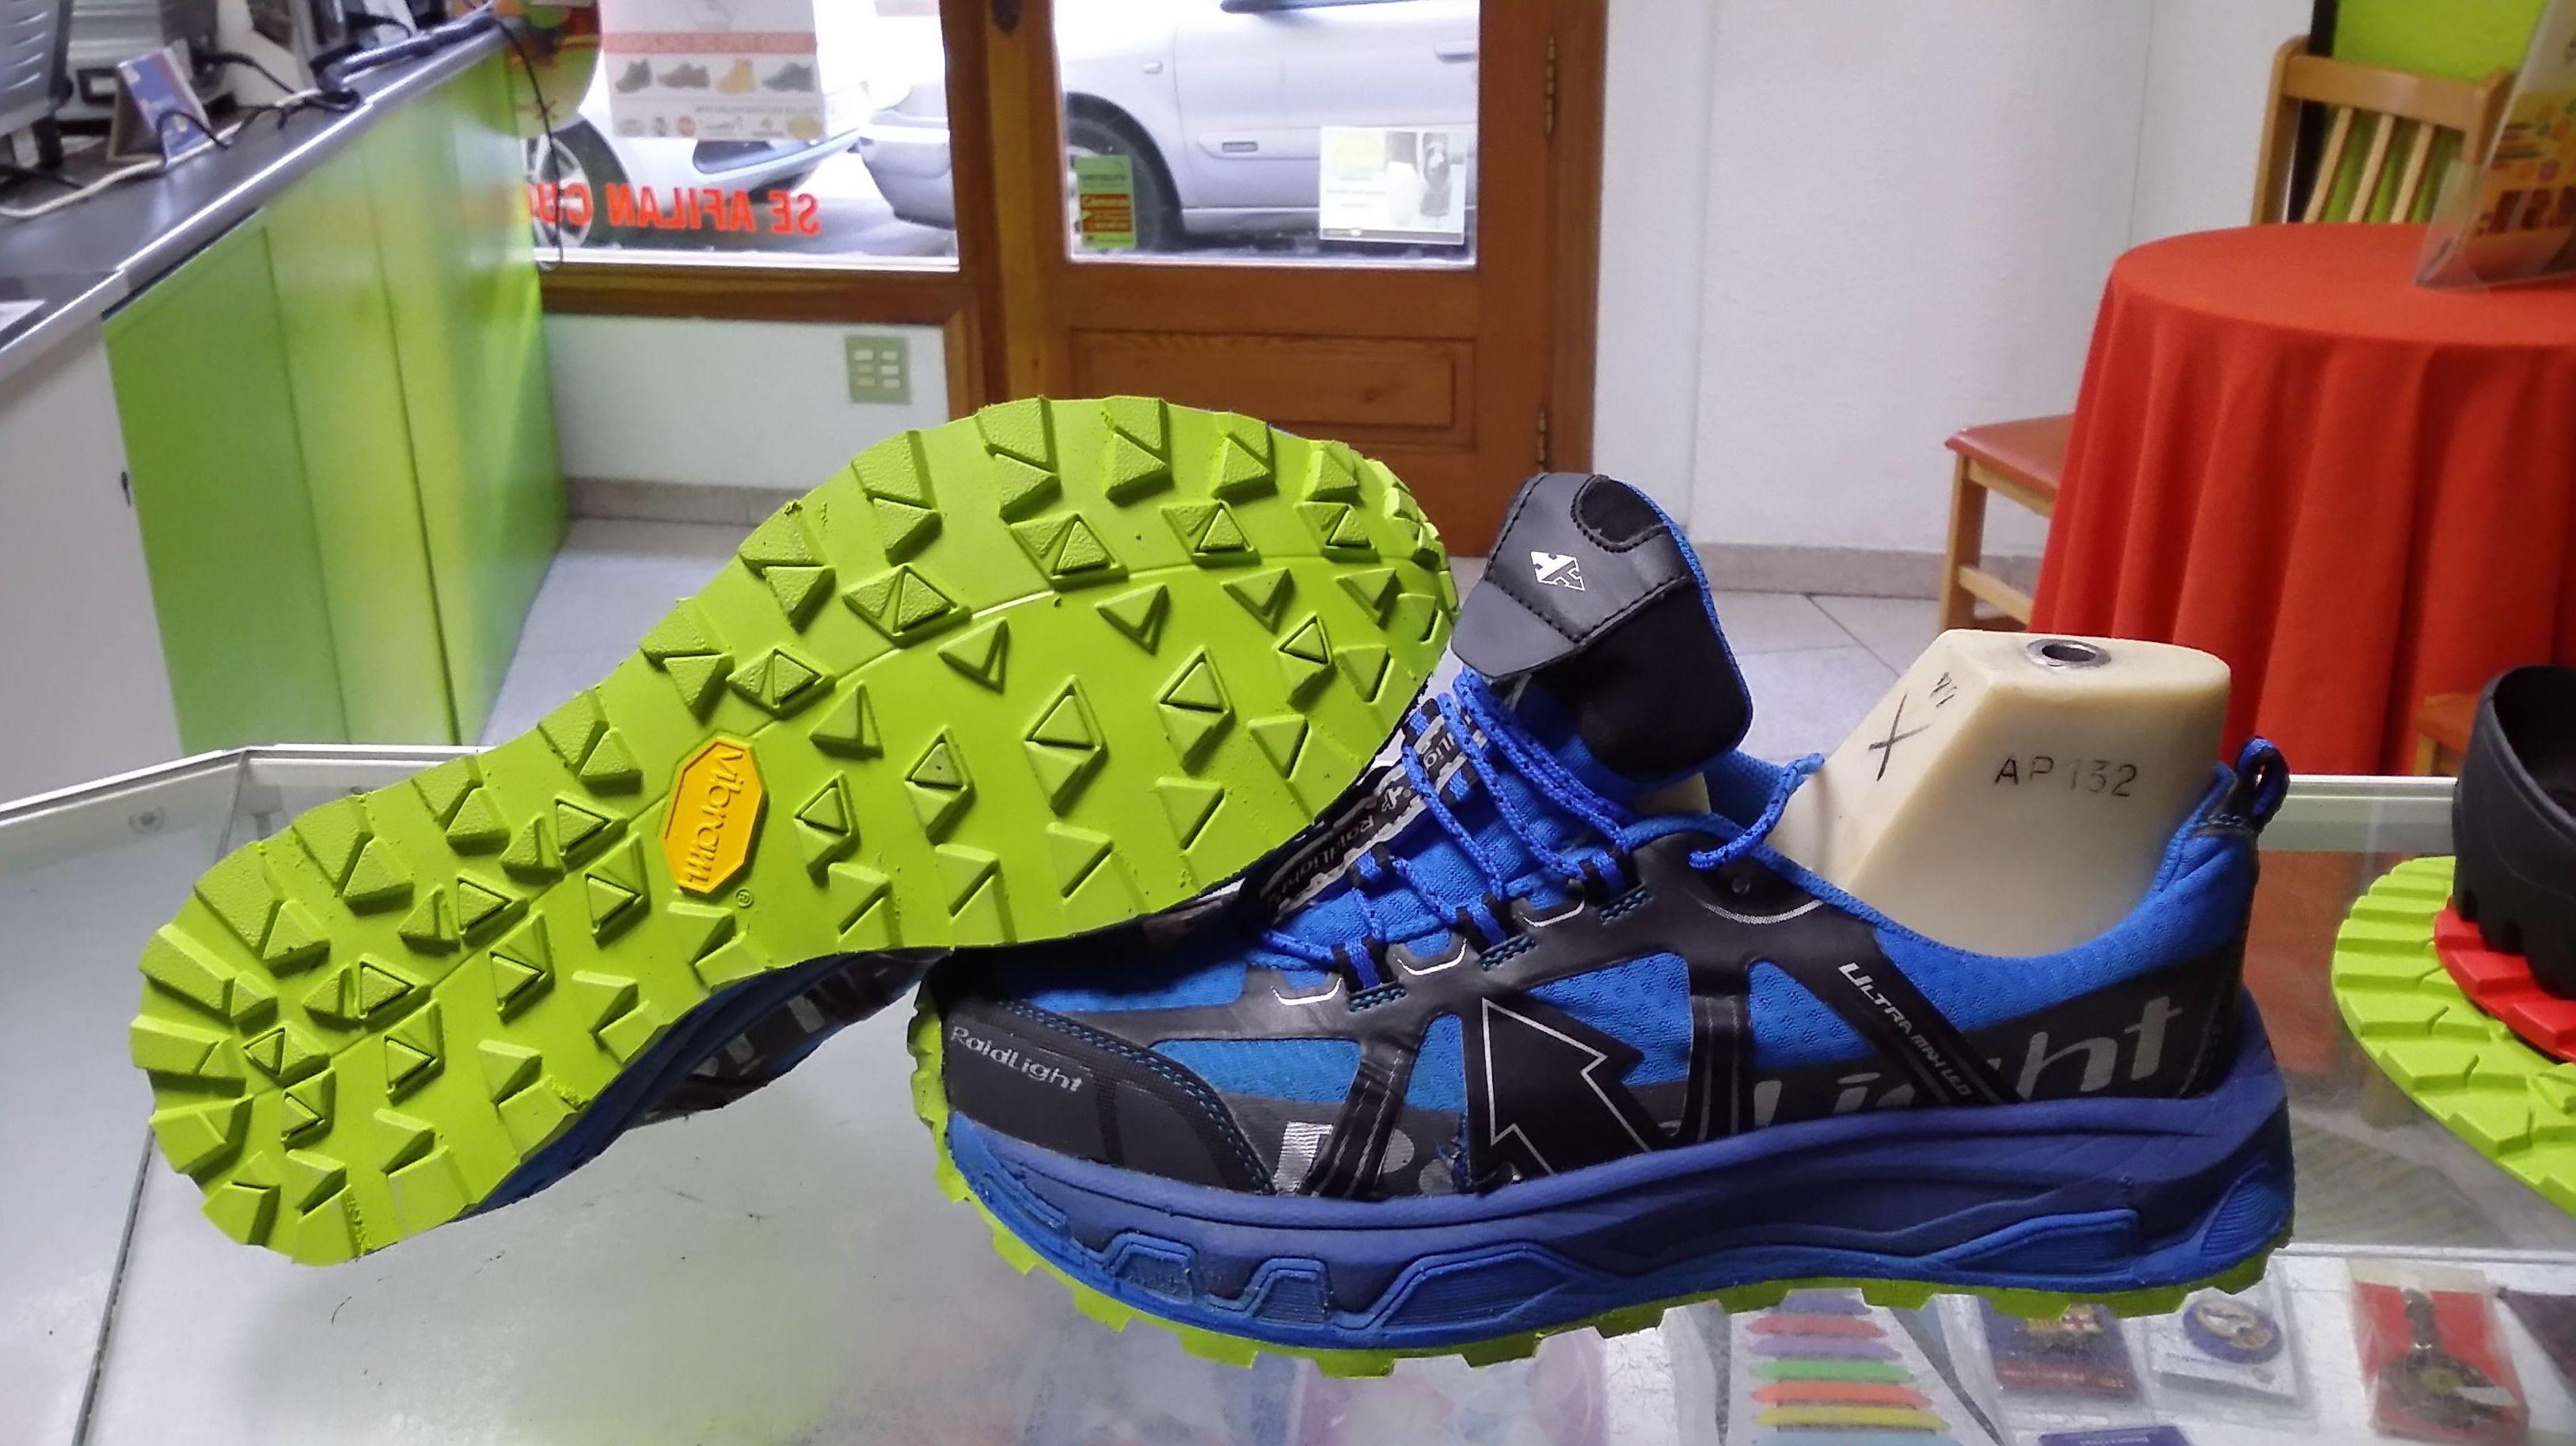 Foto 7 de Reparación de calzado en Castellón | Roig Vidal